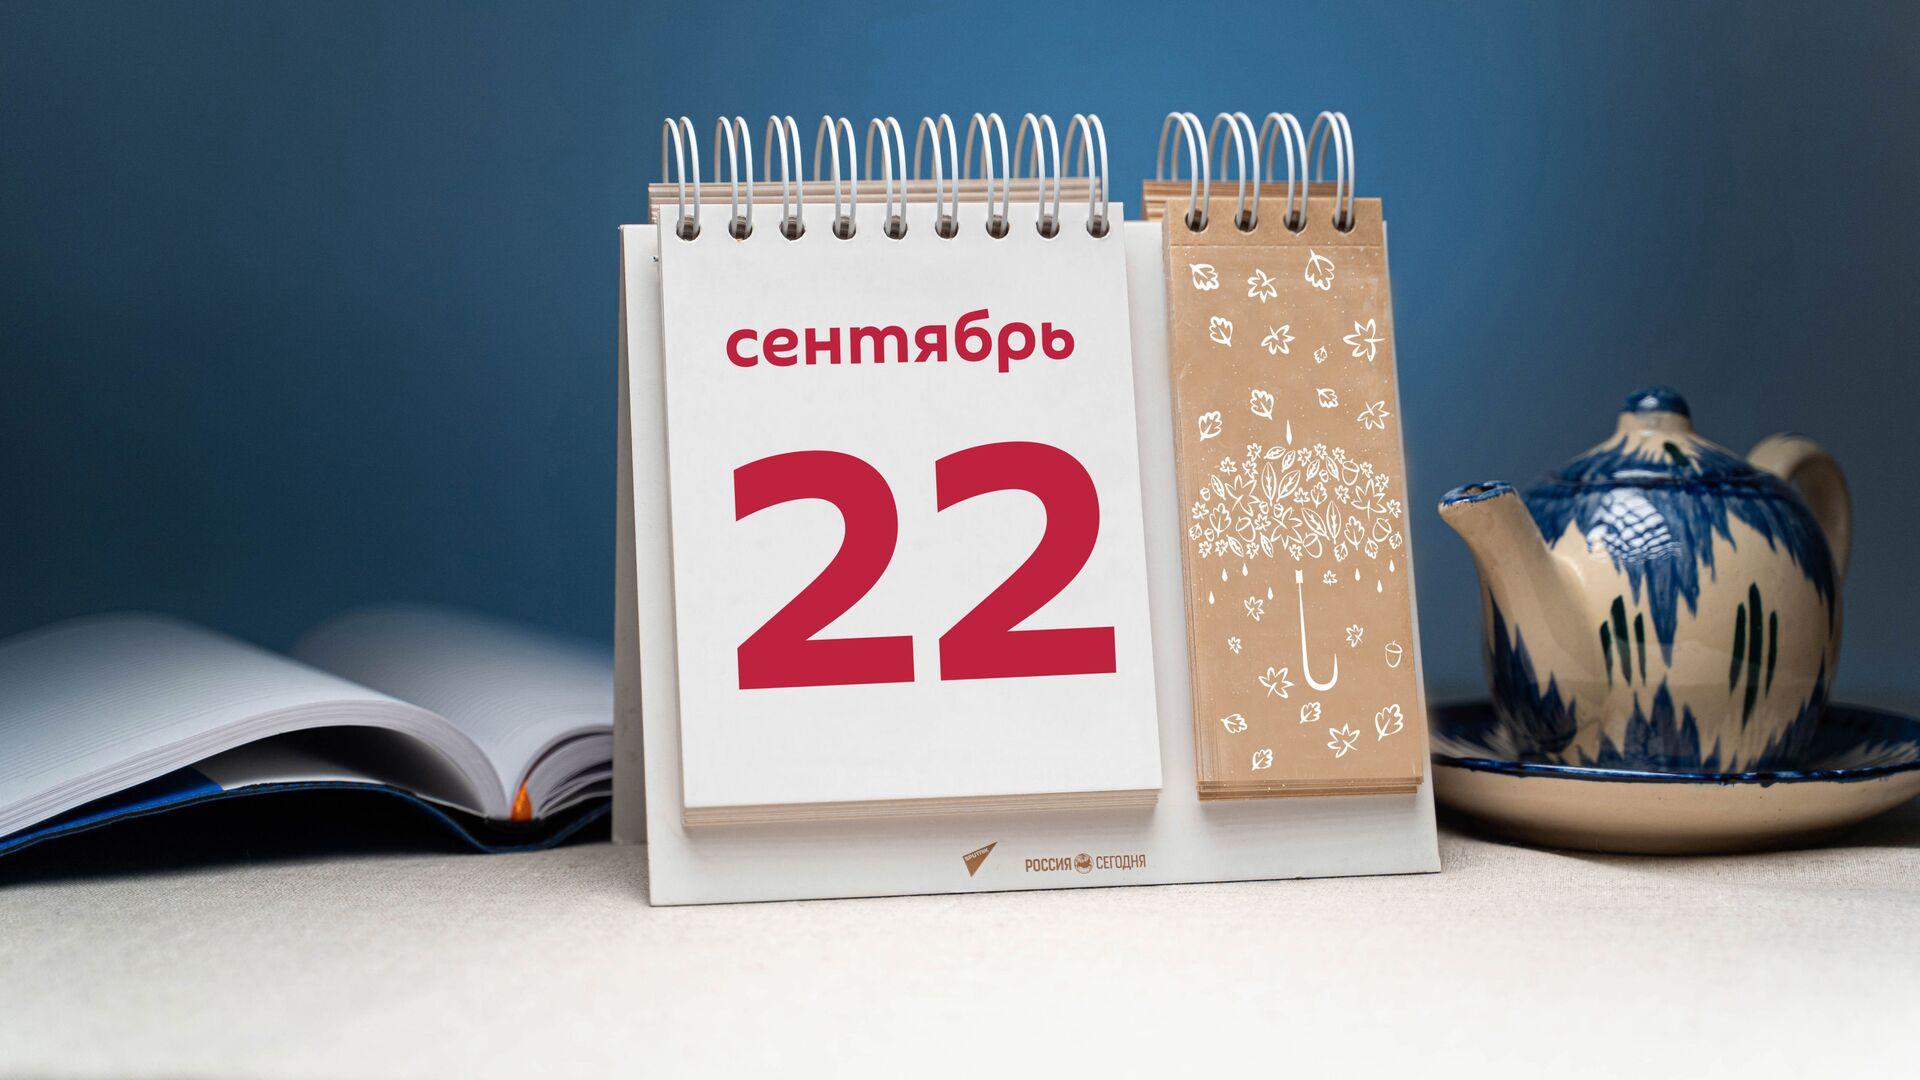 День 22 сентября - Sputnik Тоҷикистон, 1920, 22.09.2021